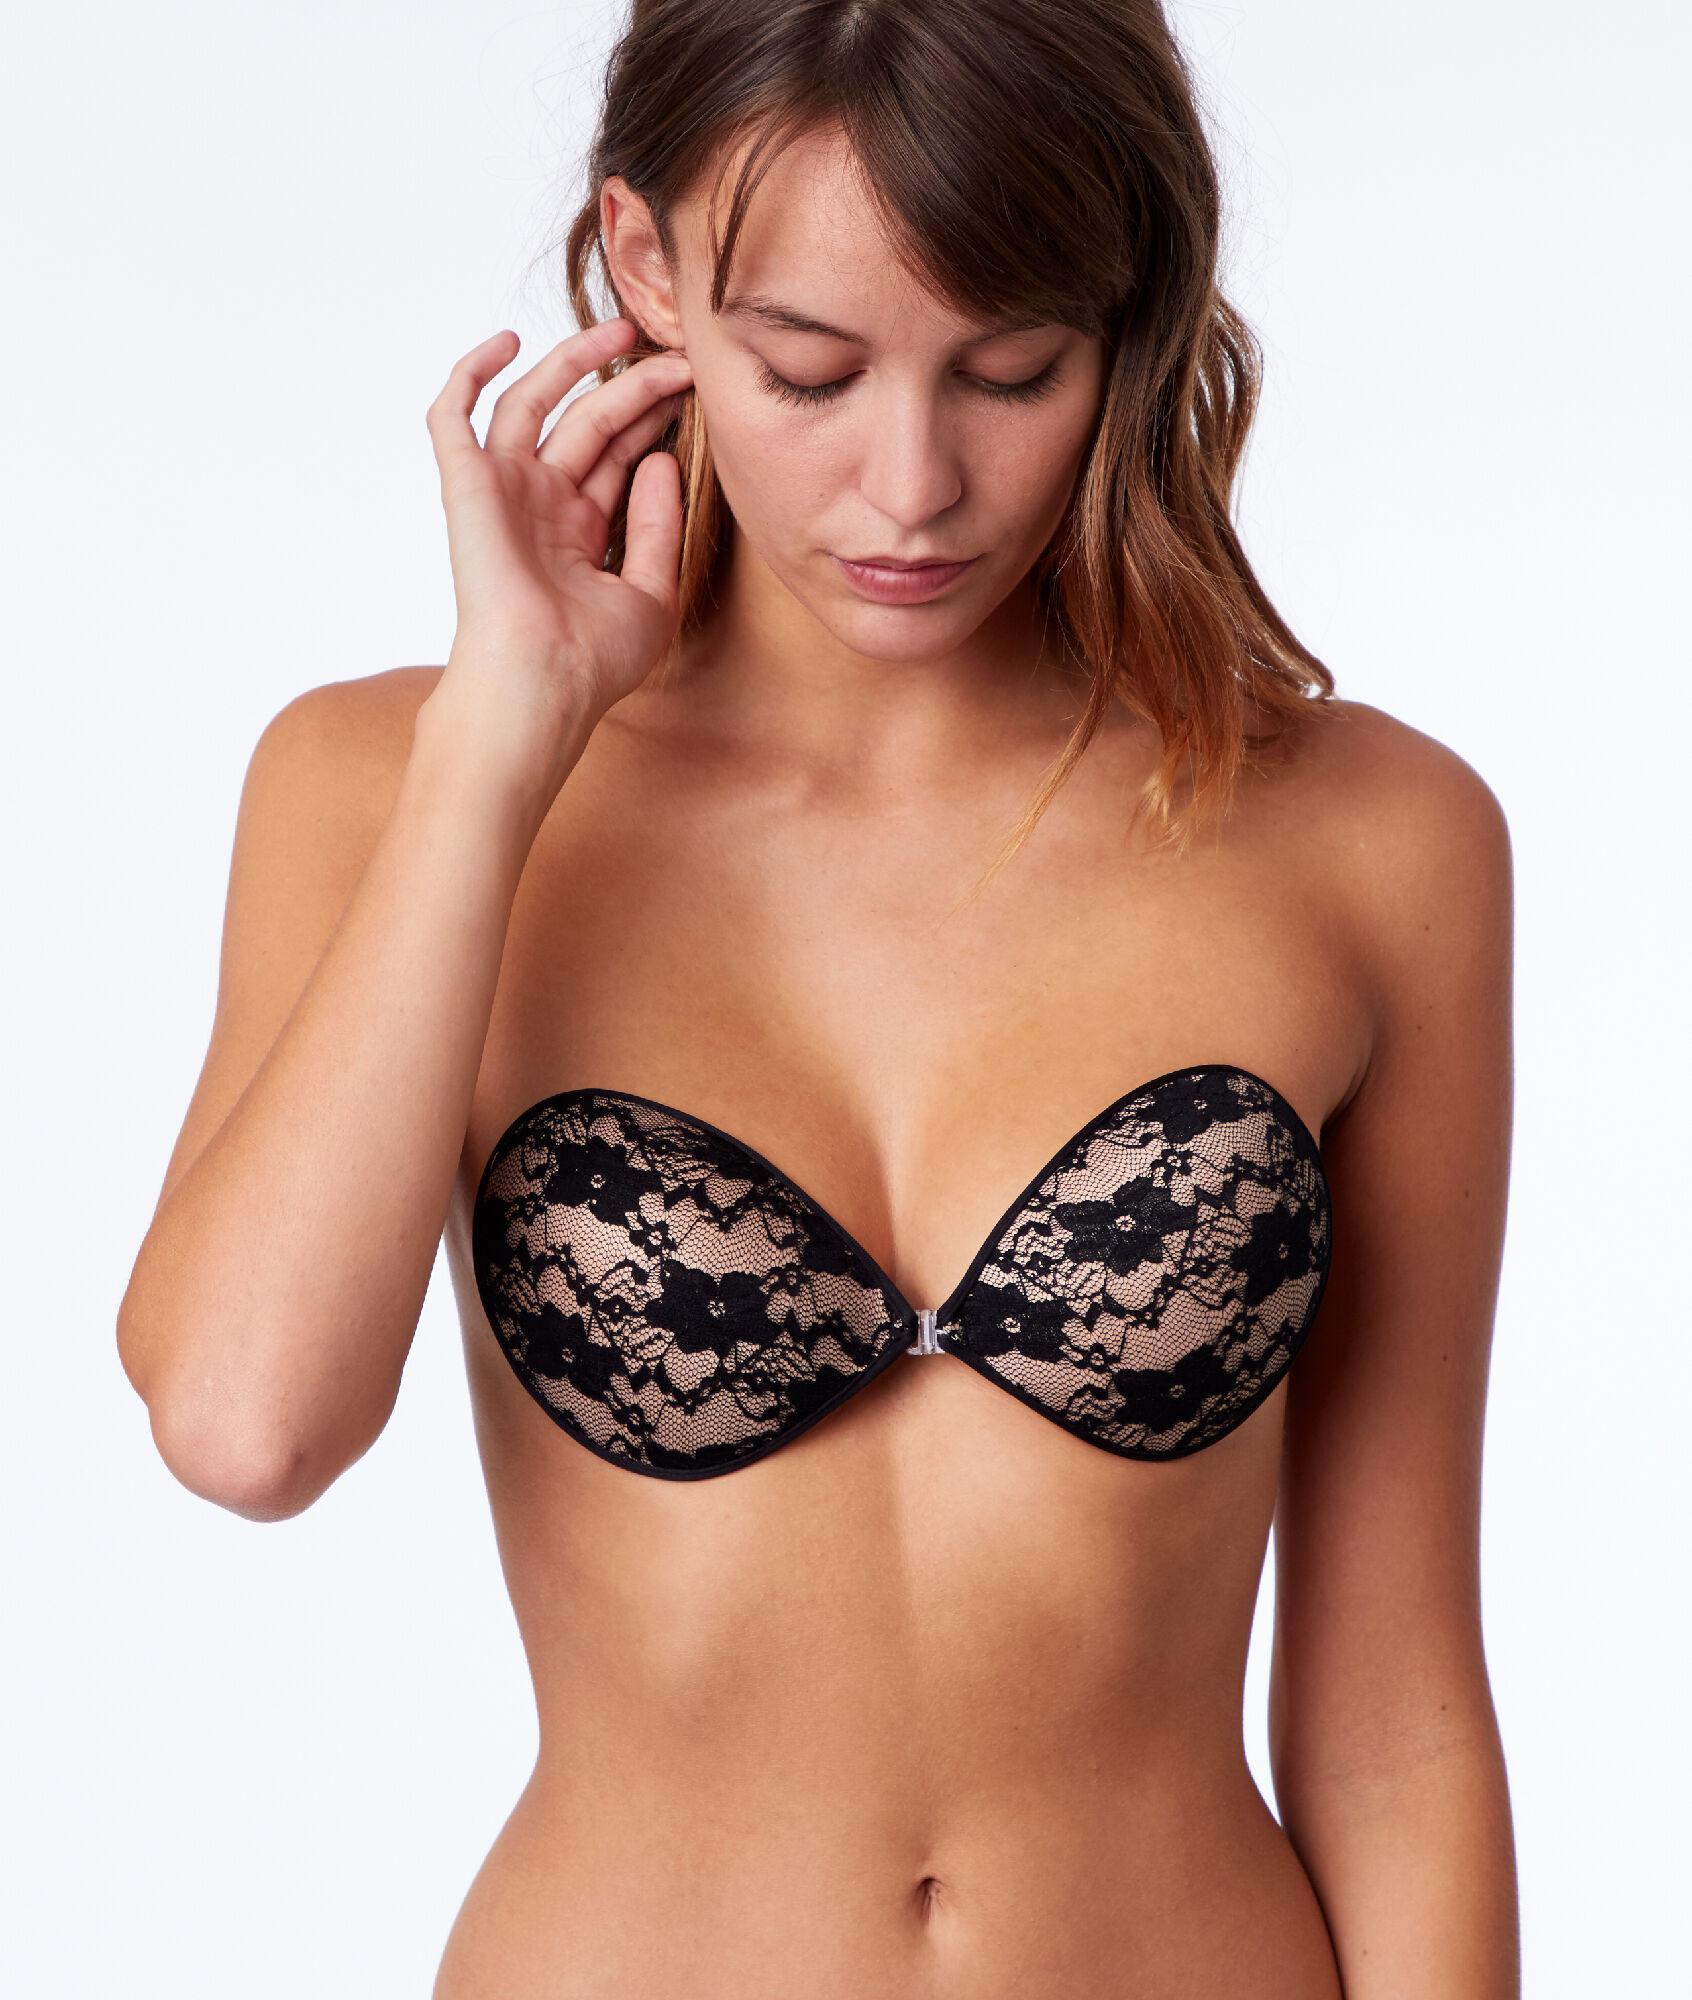 9826b0d47 Lace stick on bra - Etam